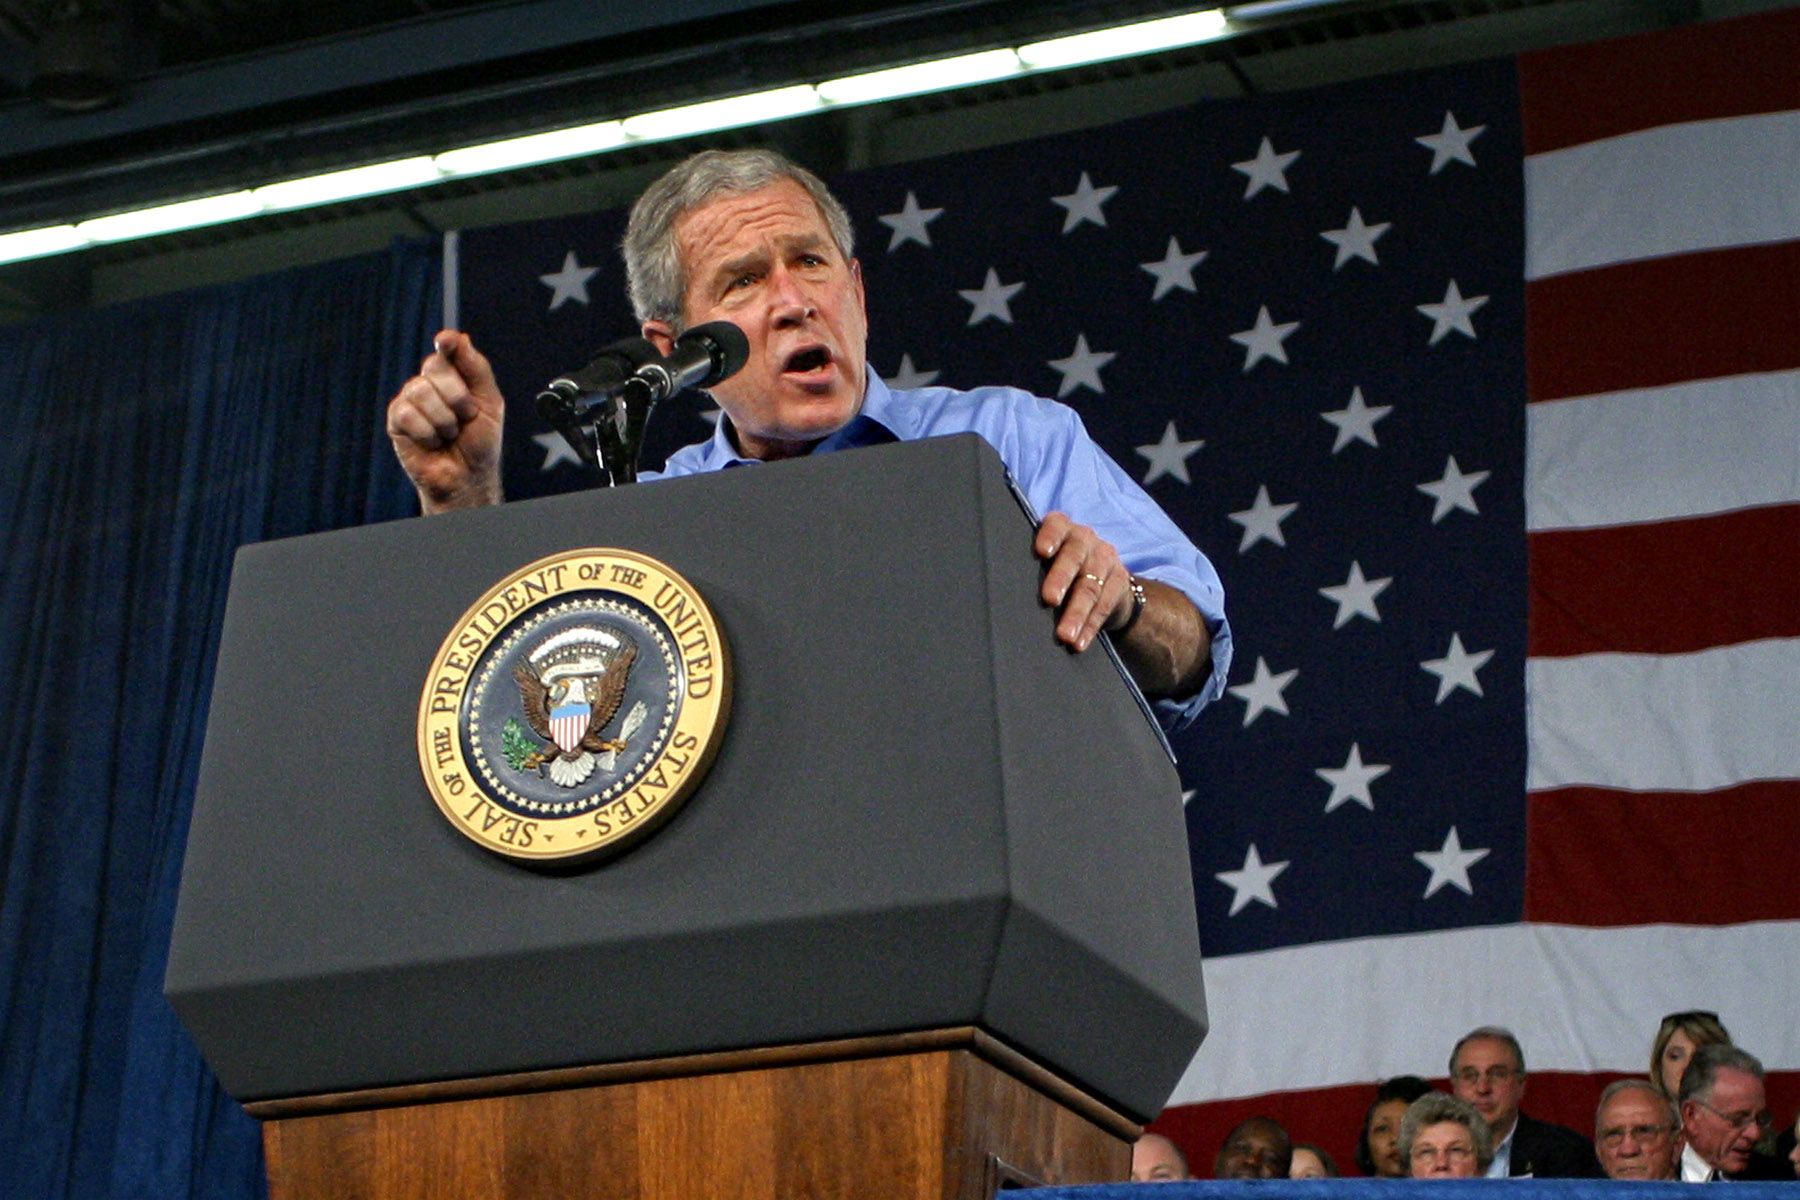 PresidentBush3.jpg